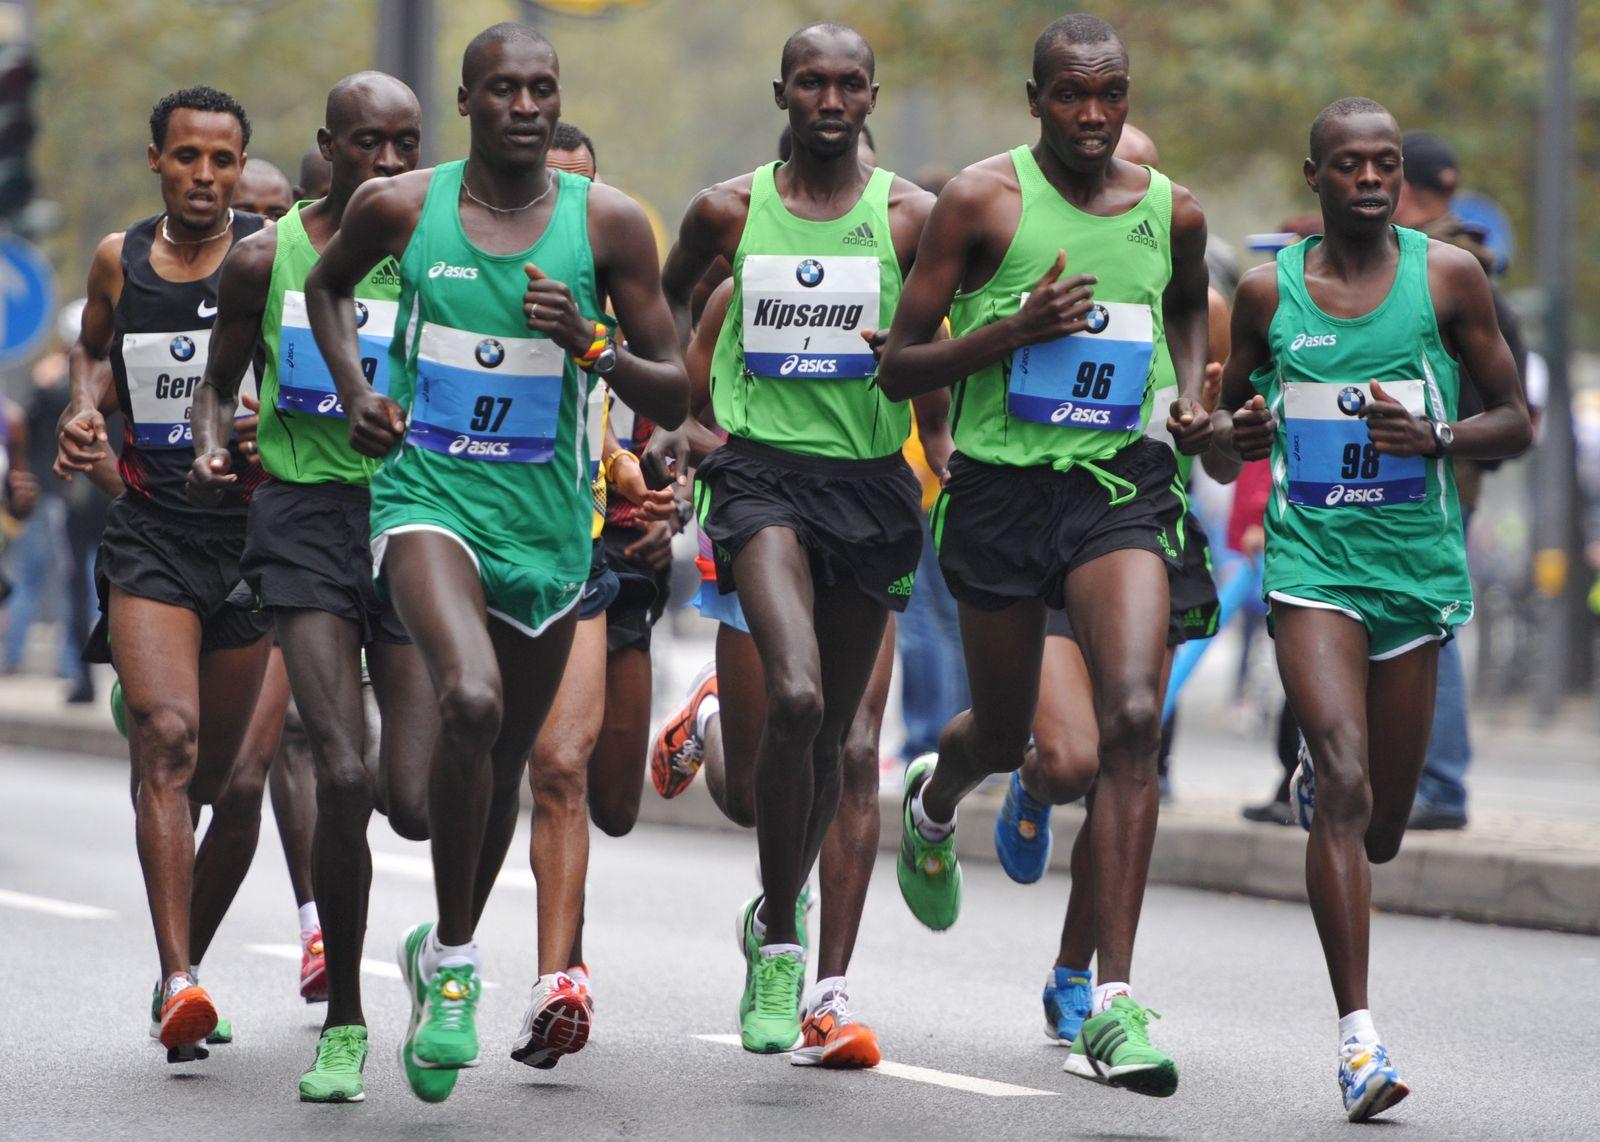 Frankfurt Marathon - Kipsang gewinnt